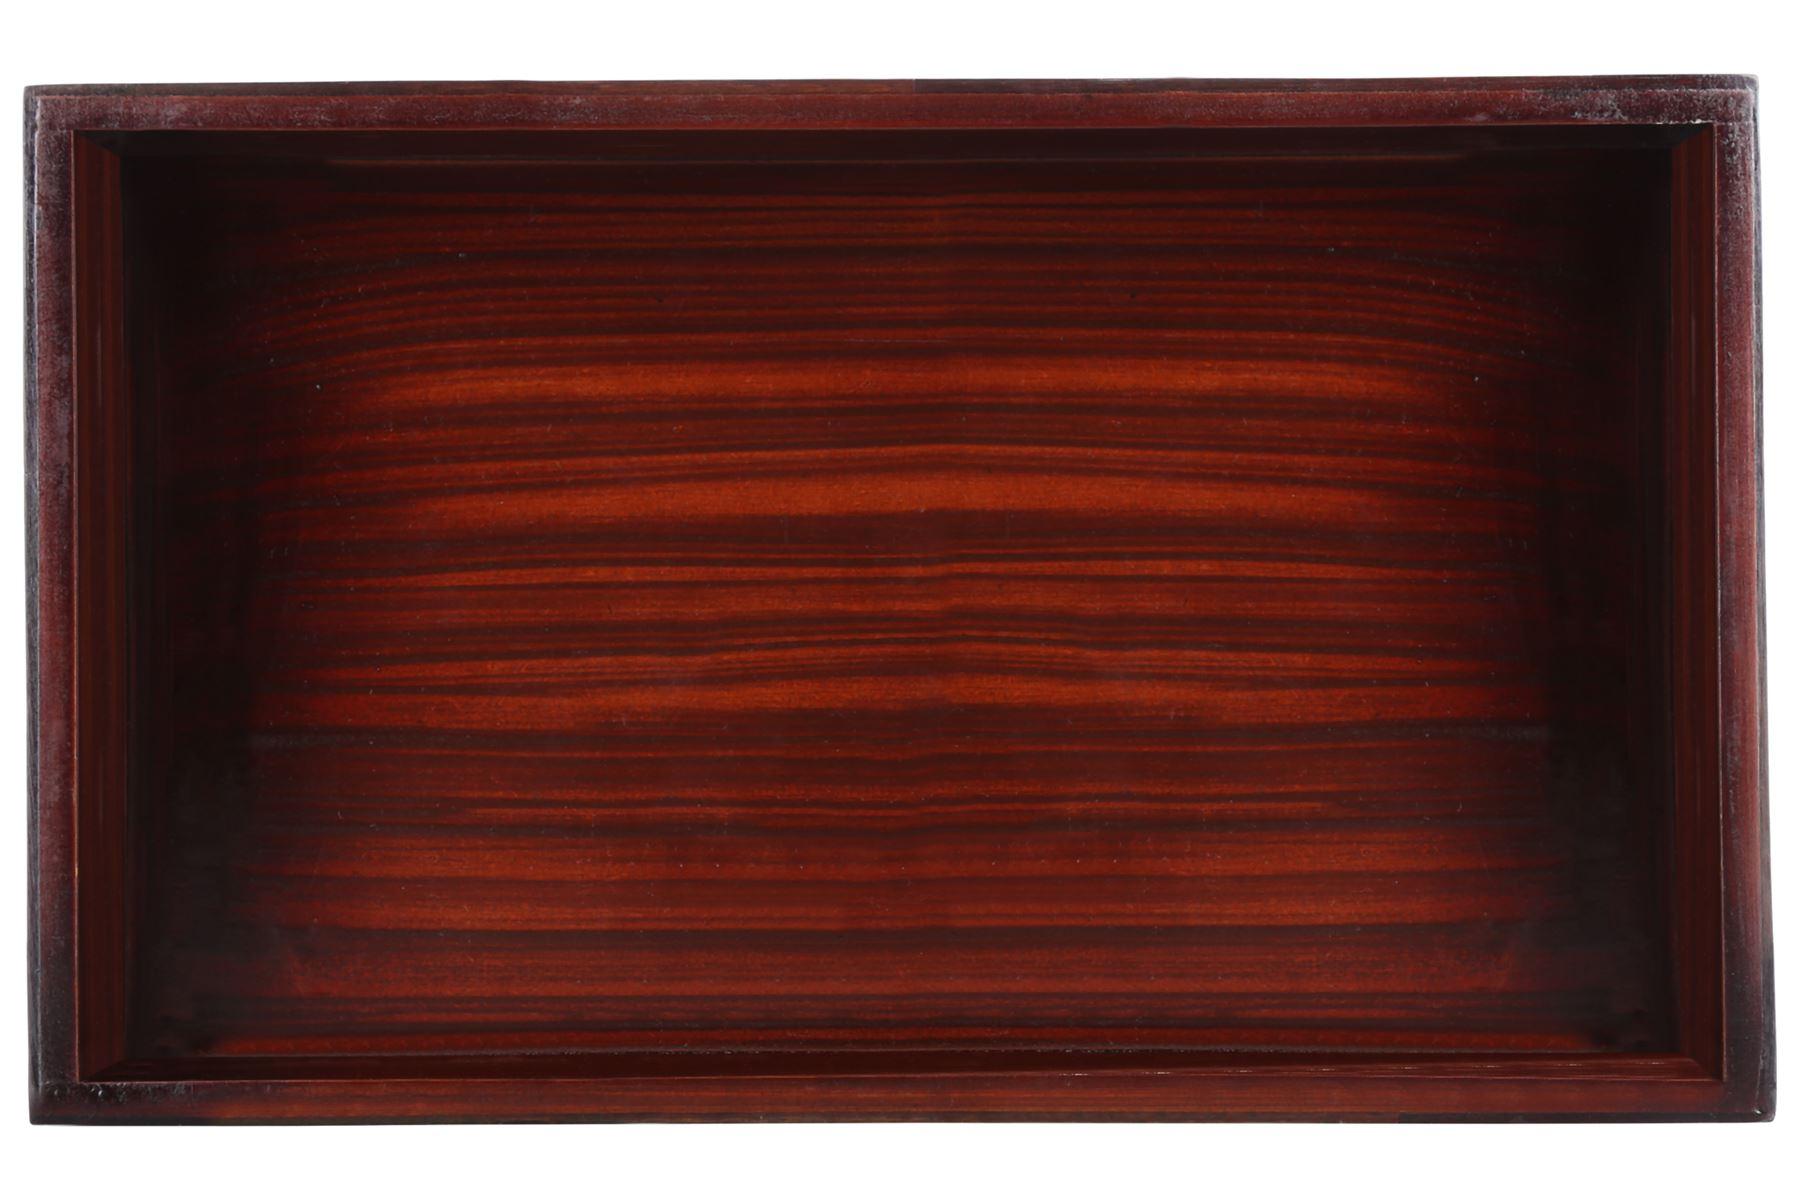 Handicrafts-Home-Verdigris-Ideal-Ottoman-Multipurpose-Serving-Decorative-Tray thumbnail 3